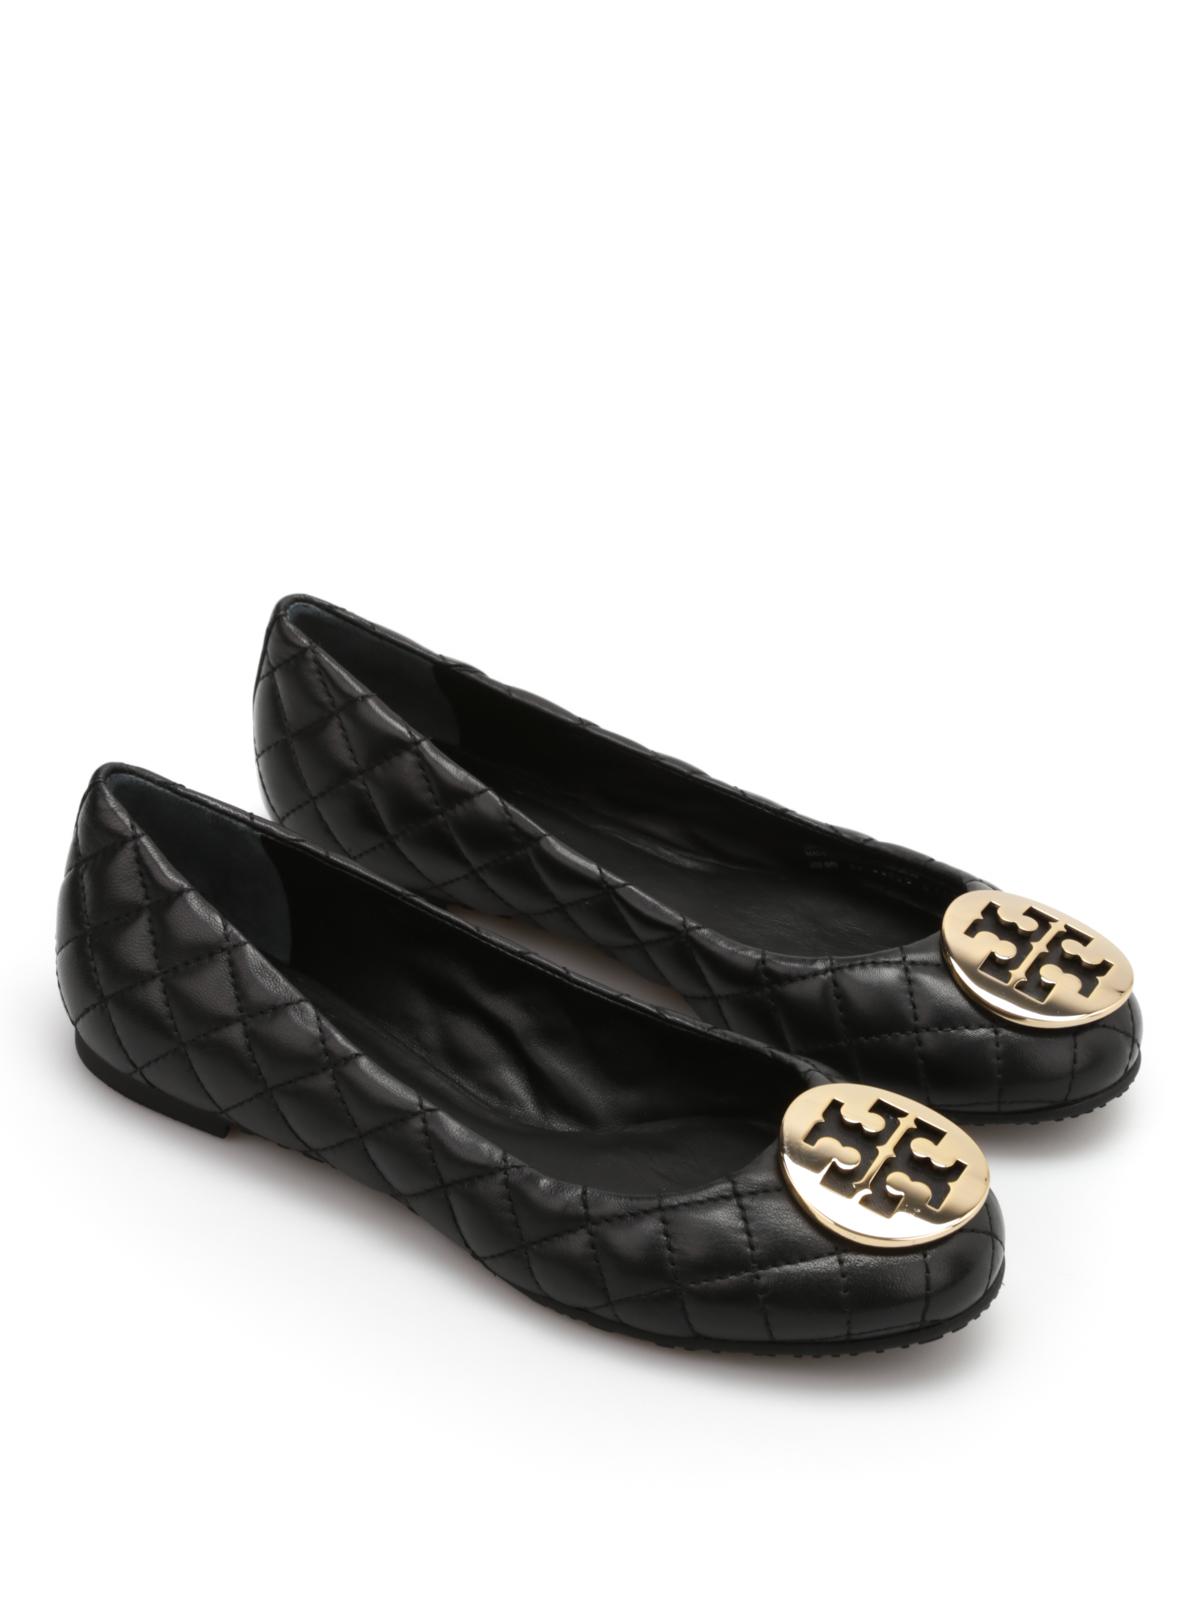 83ce1a37769 Tory Burch - Leather Quinn flats - flat shoes - 50008602 051